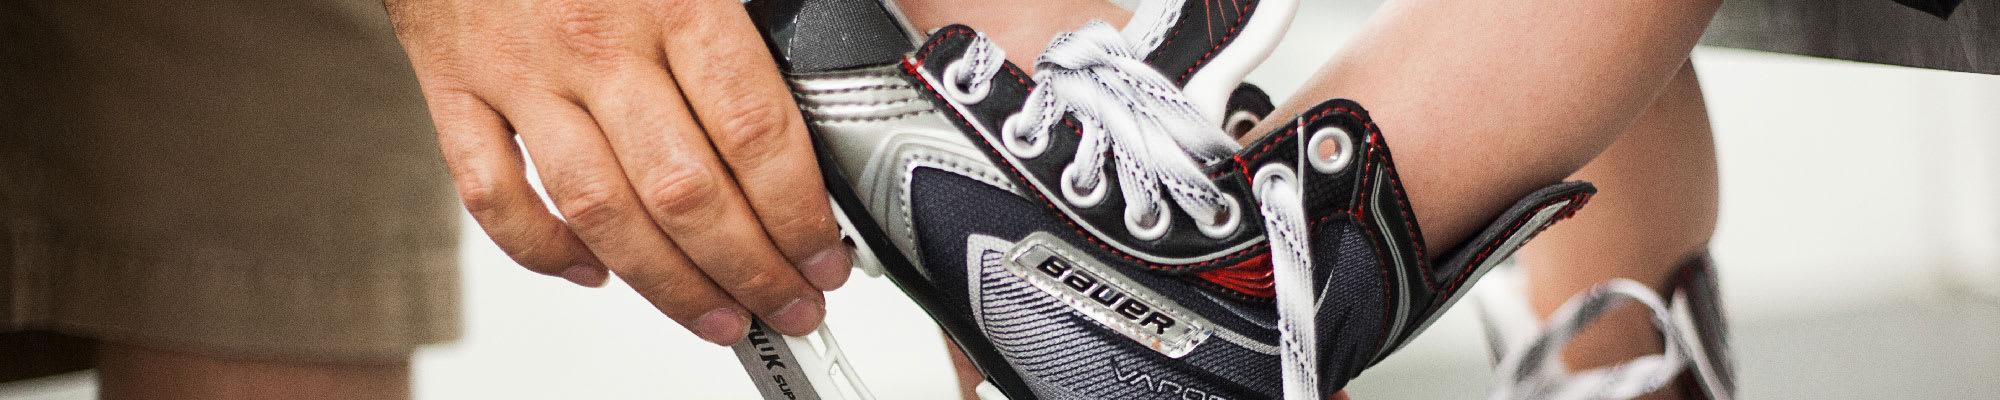 6abe4474bce How to Fit Hockey Skates